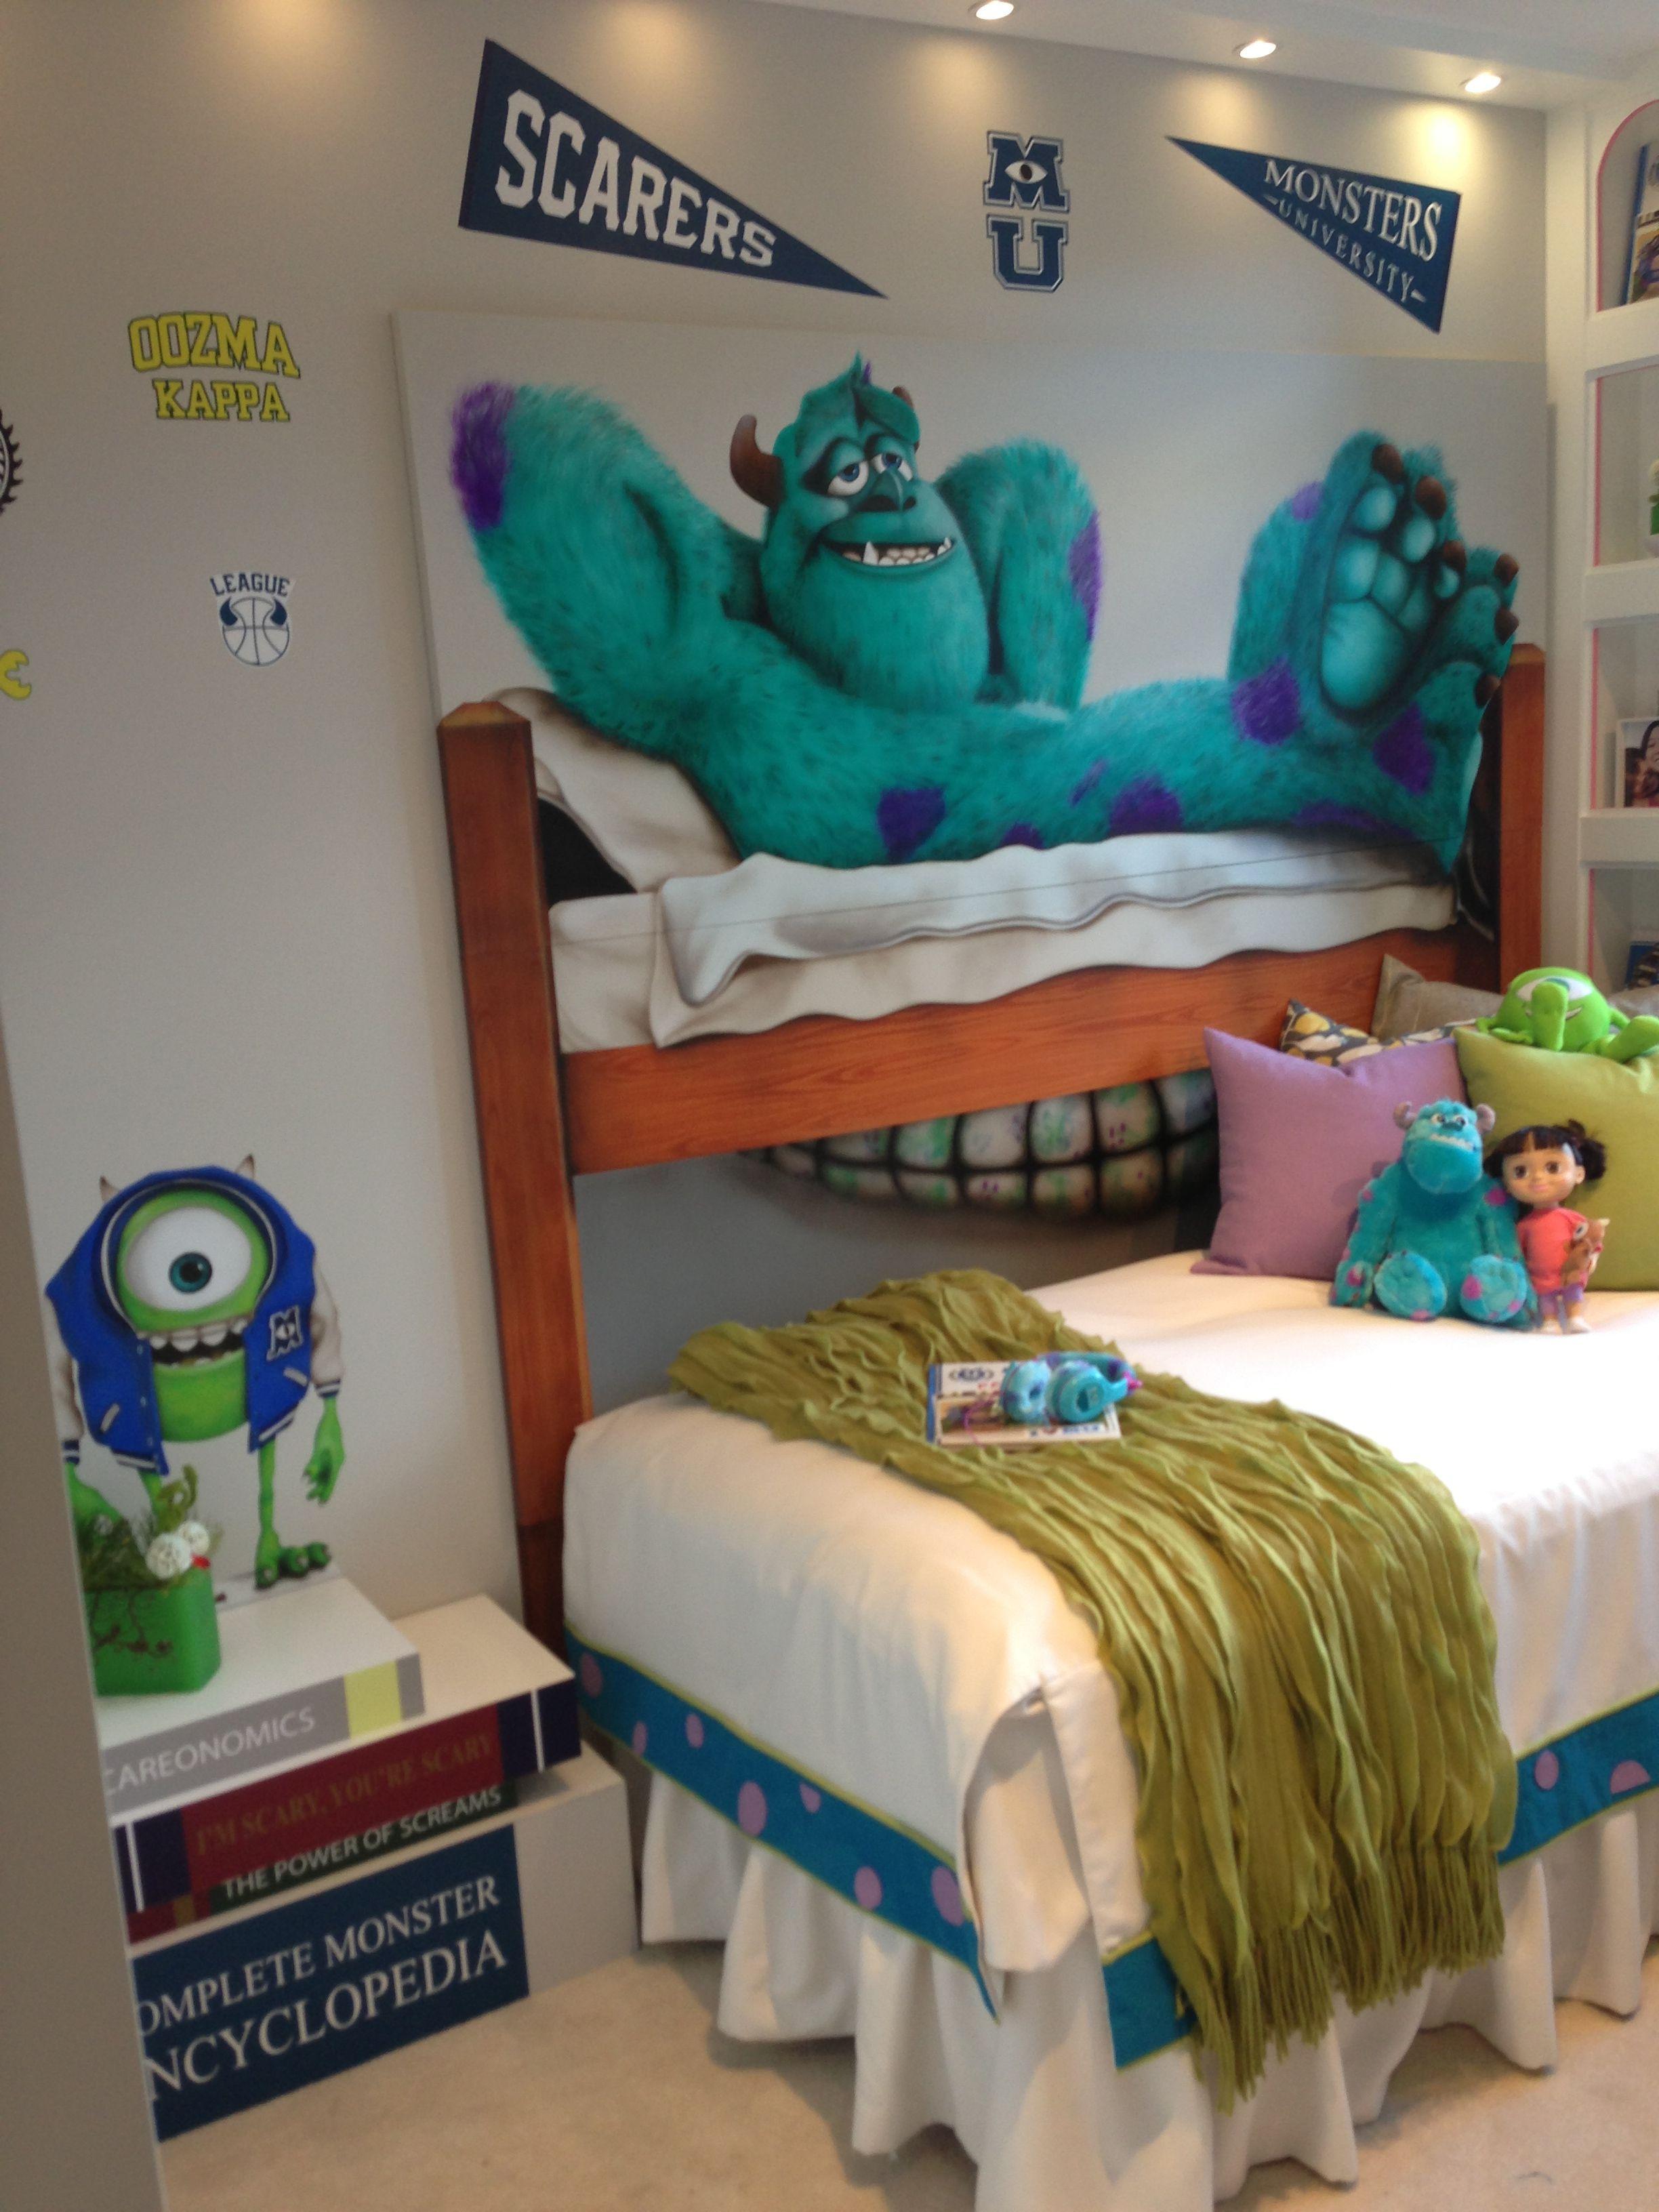 Monsters Inc Room Decor.Crazy For Monster University Kid S Room At Polygon Celadon